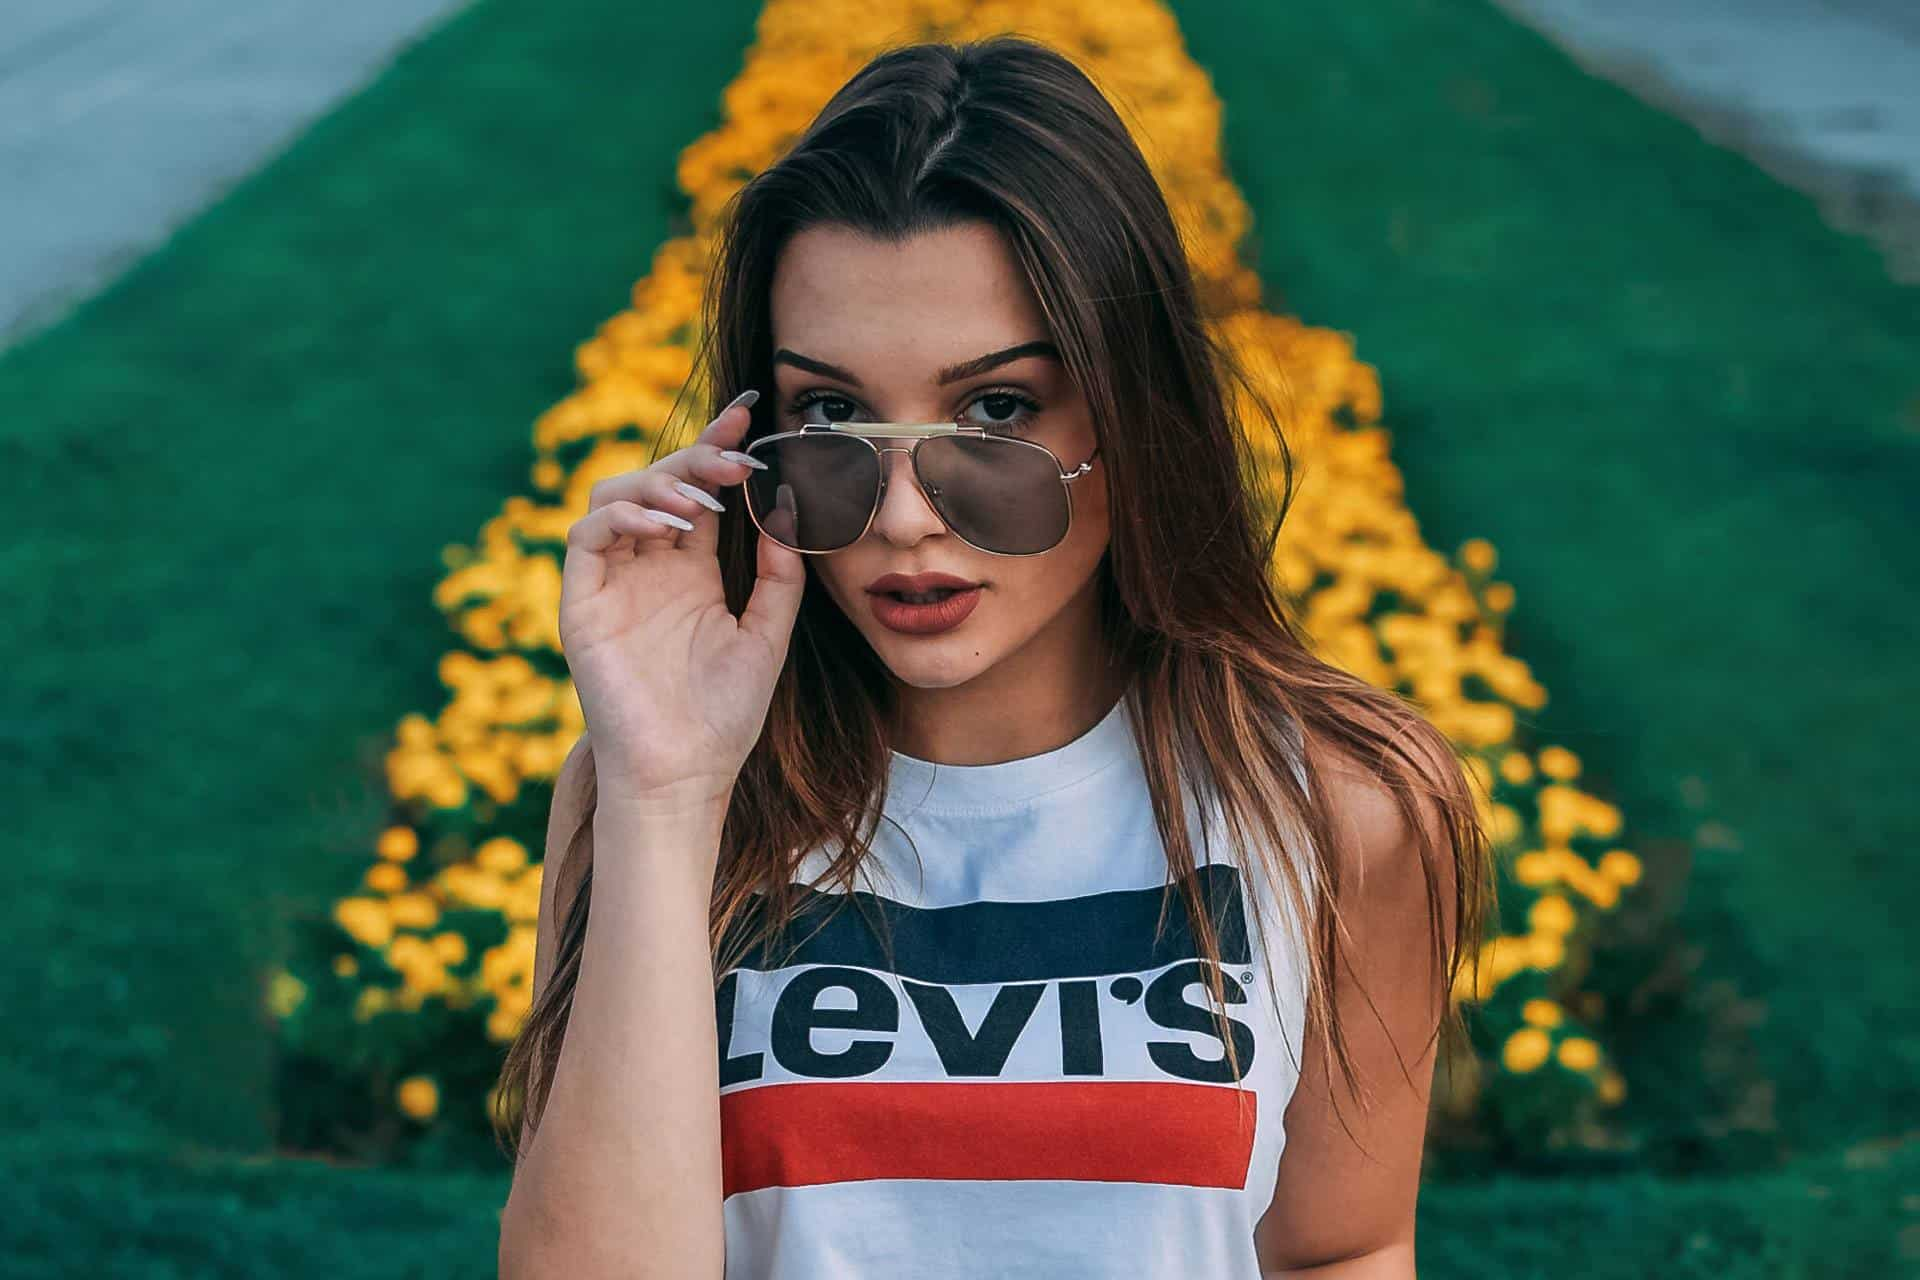 Frau in Levis Markenshirt